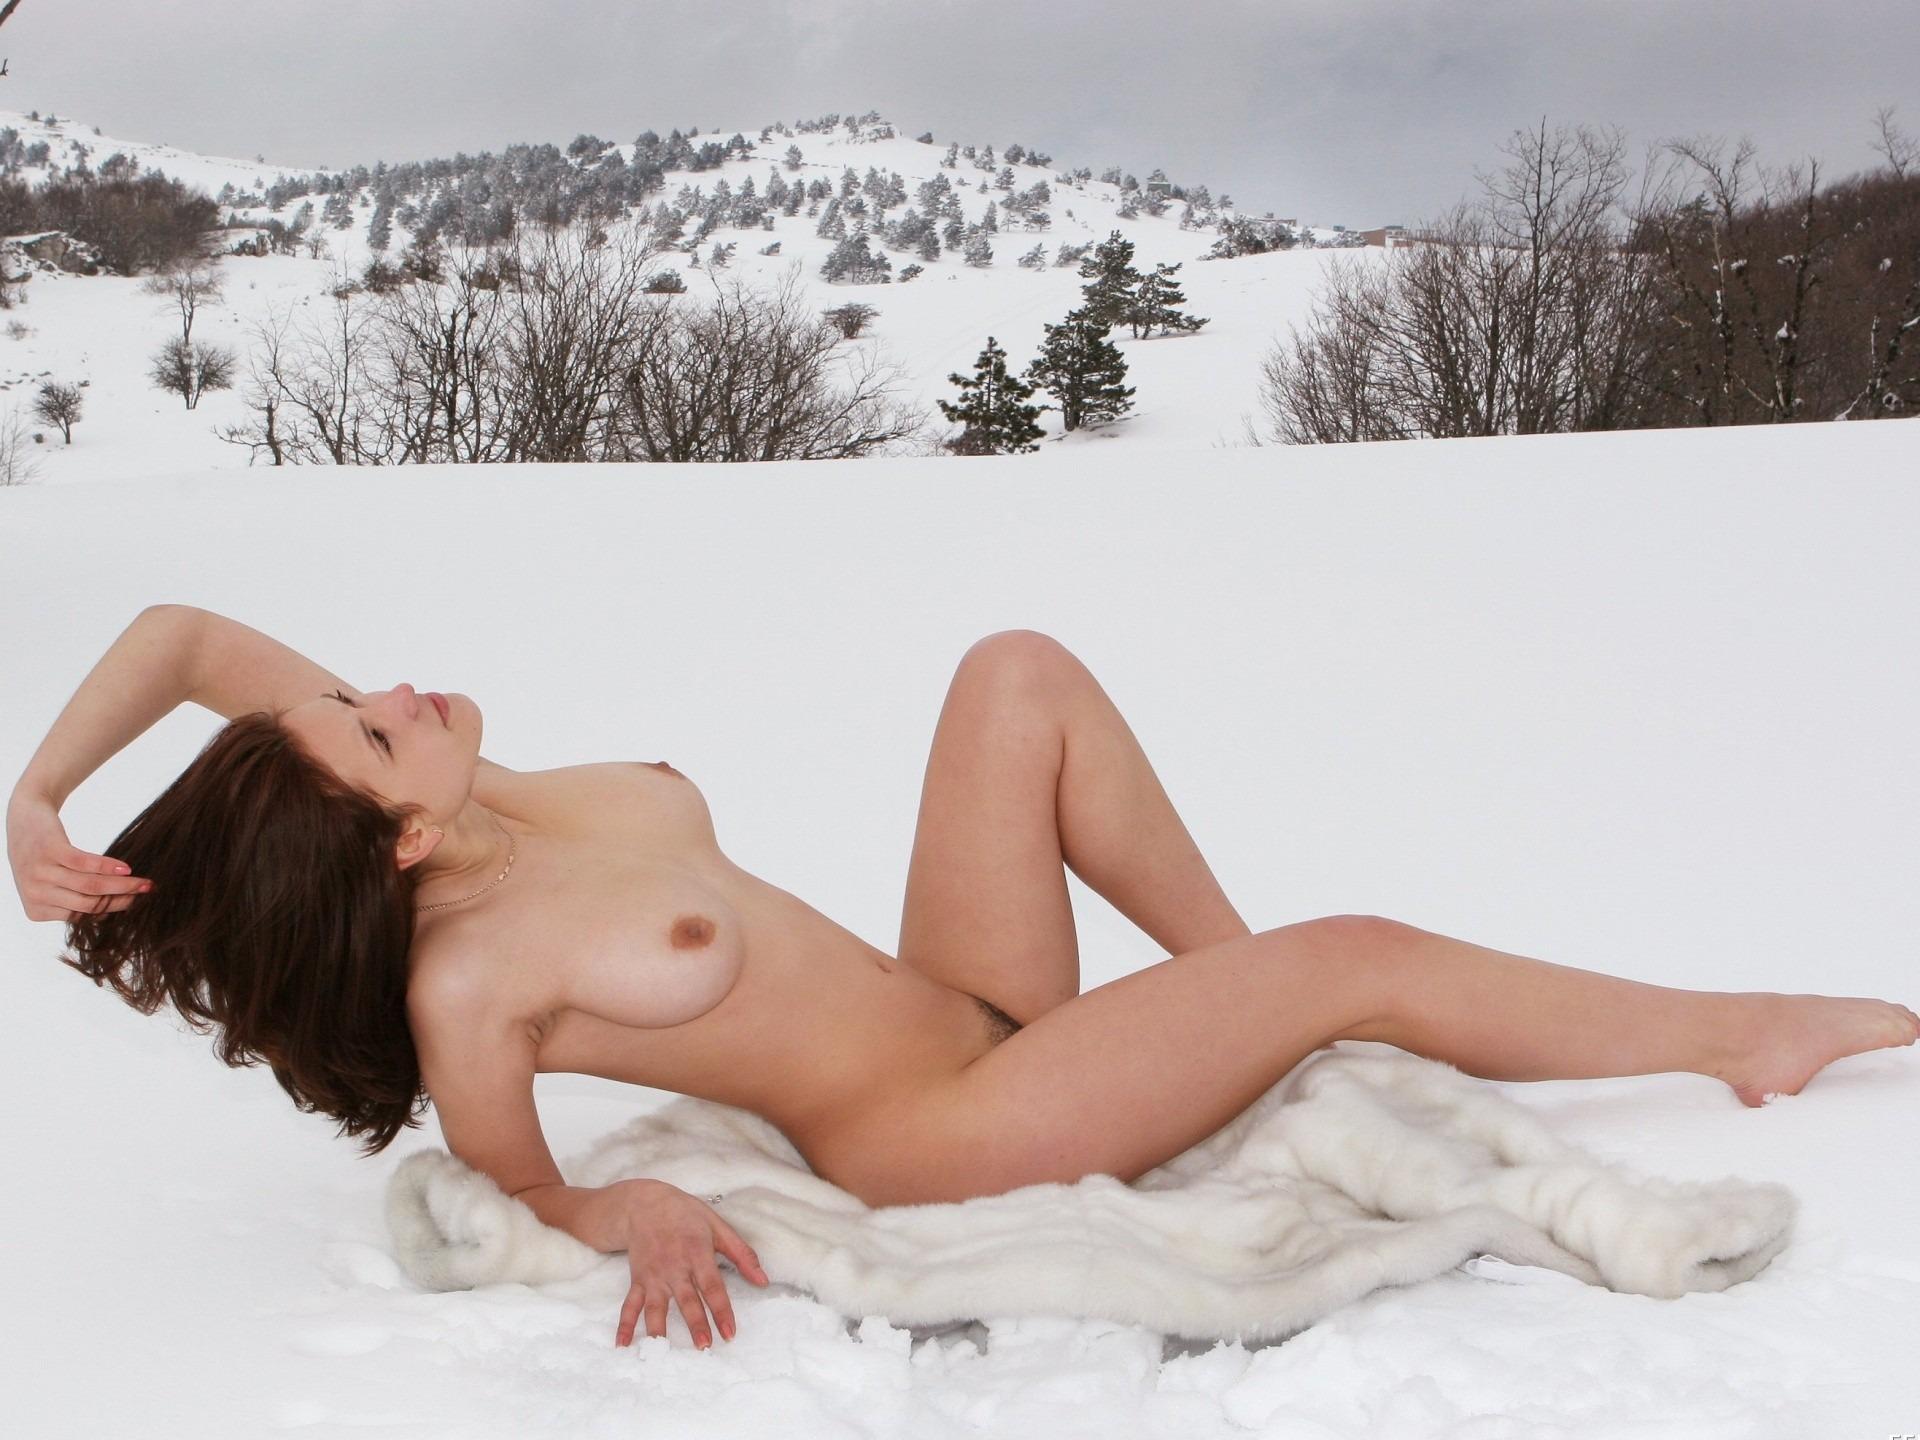 porno-kastingi-russkih-yunih